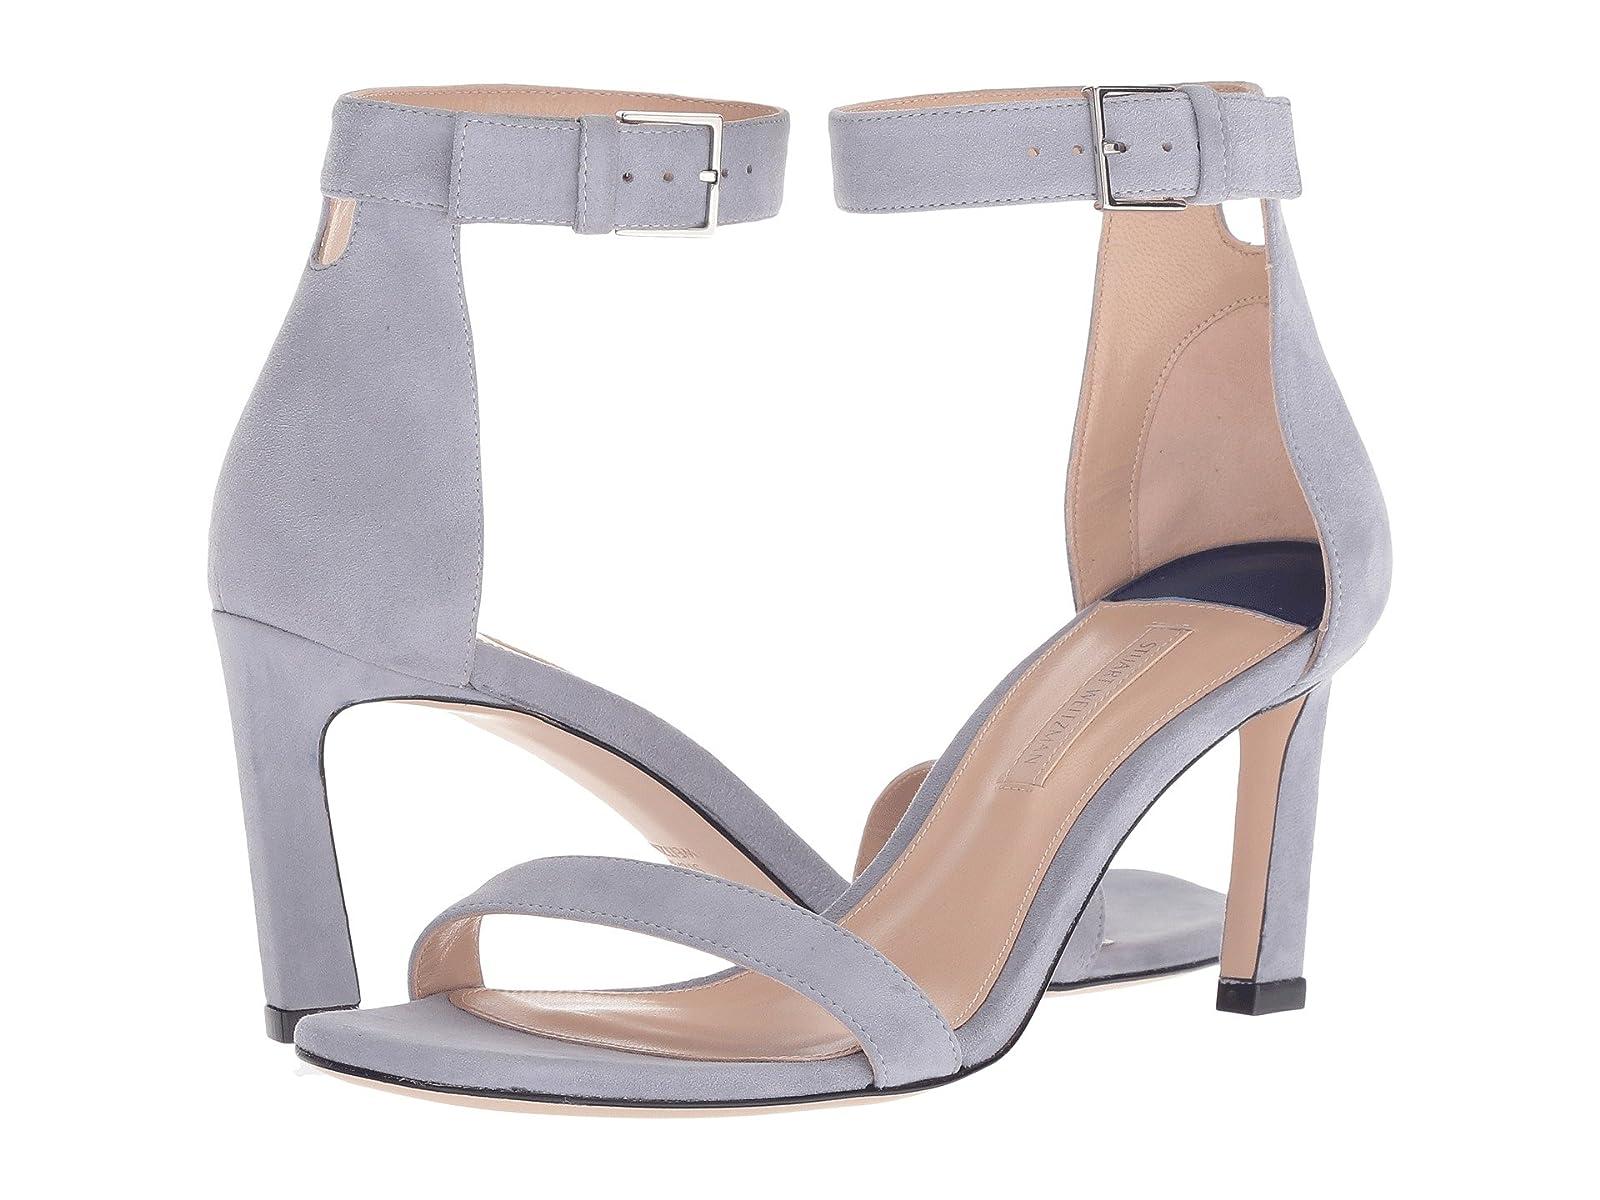 Stuart Weitzman 75 Square NudistAtmospheric grades have affordable shoes